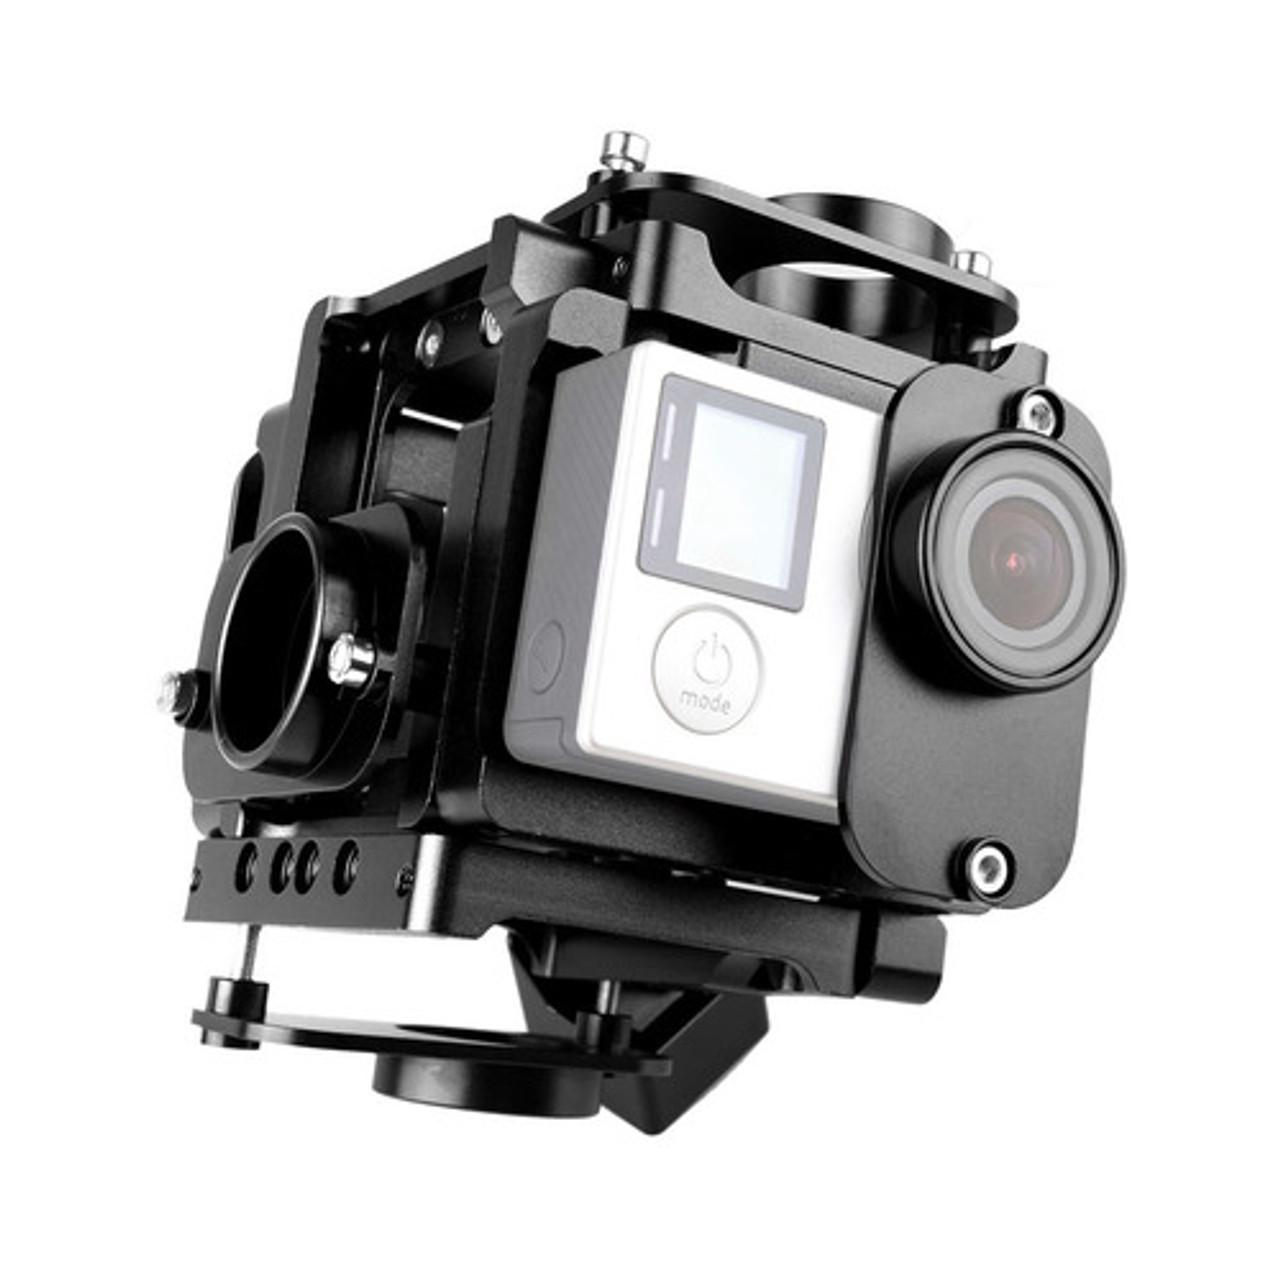 SmallRig 360¡ã 6 Camera Video Mount Holder for Gopro HERO4/3+/3 1833